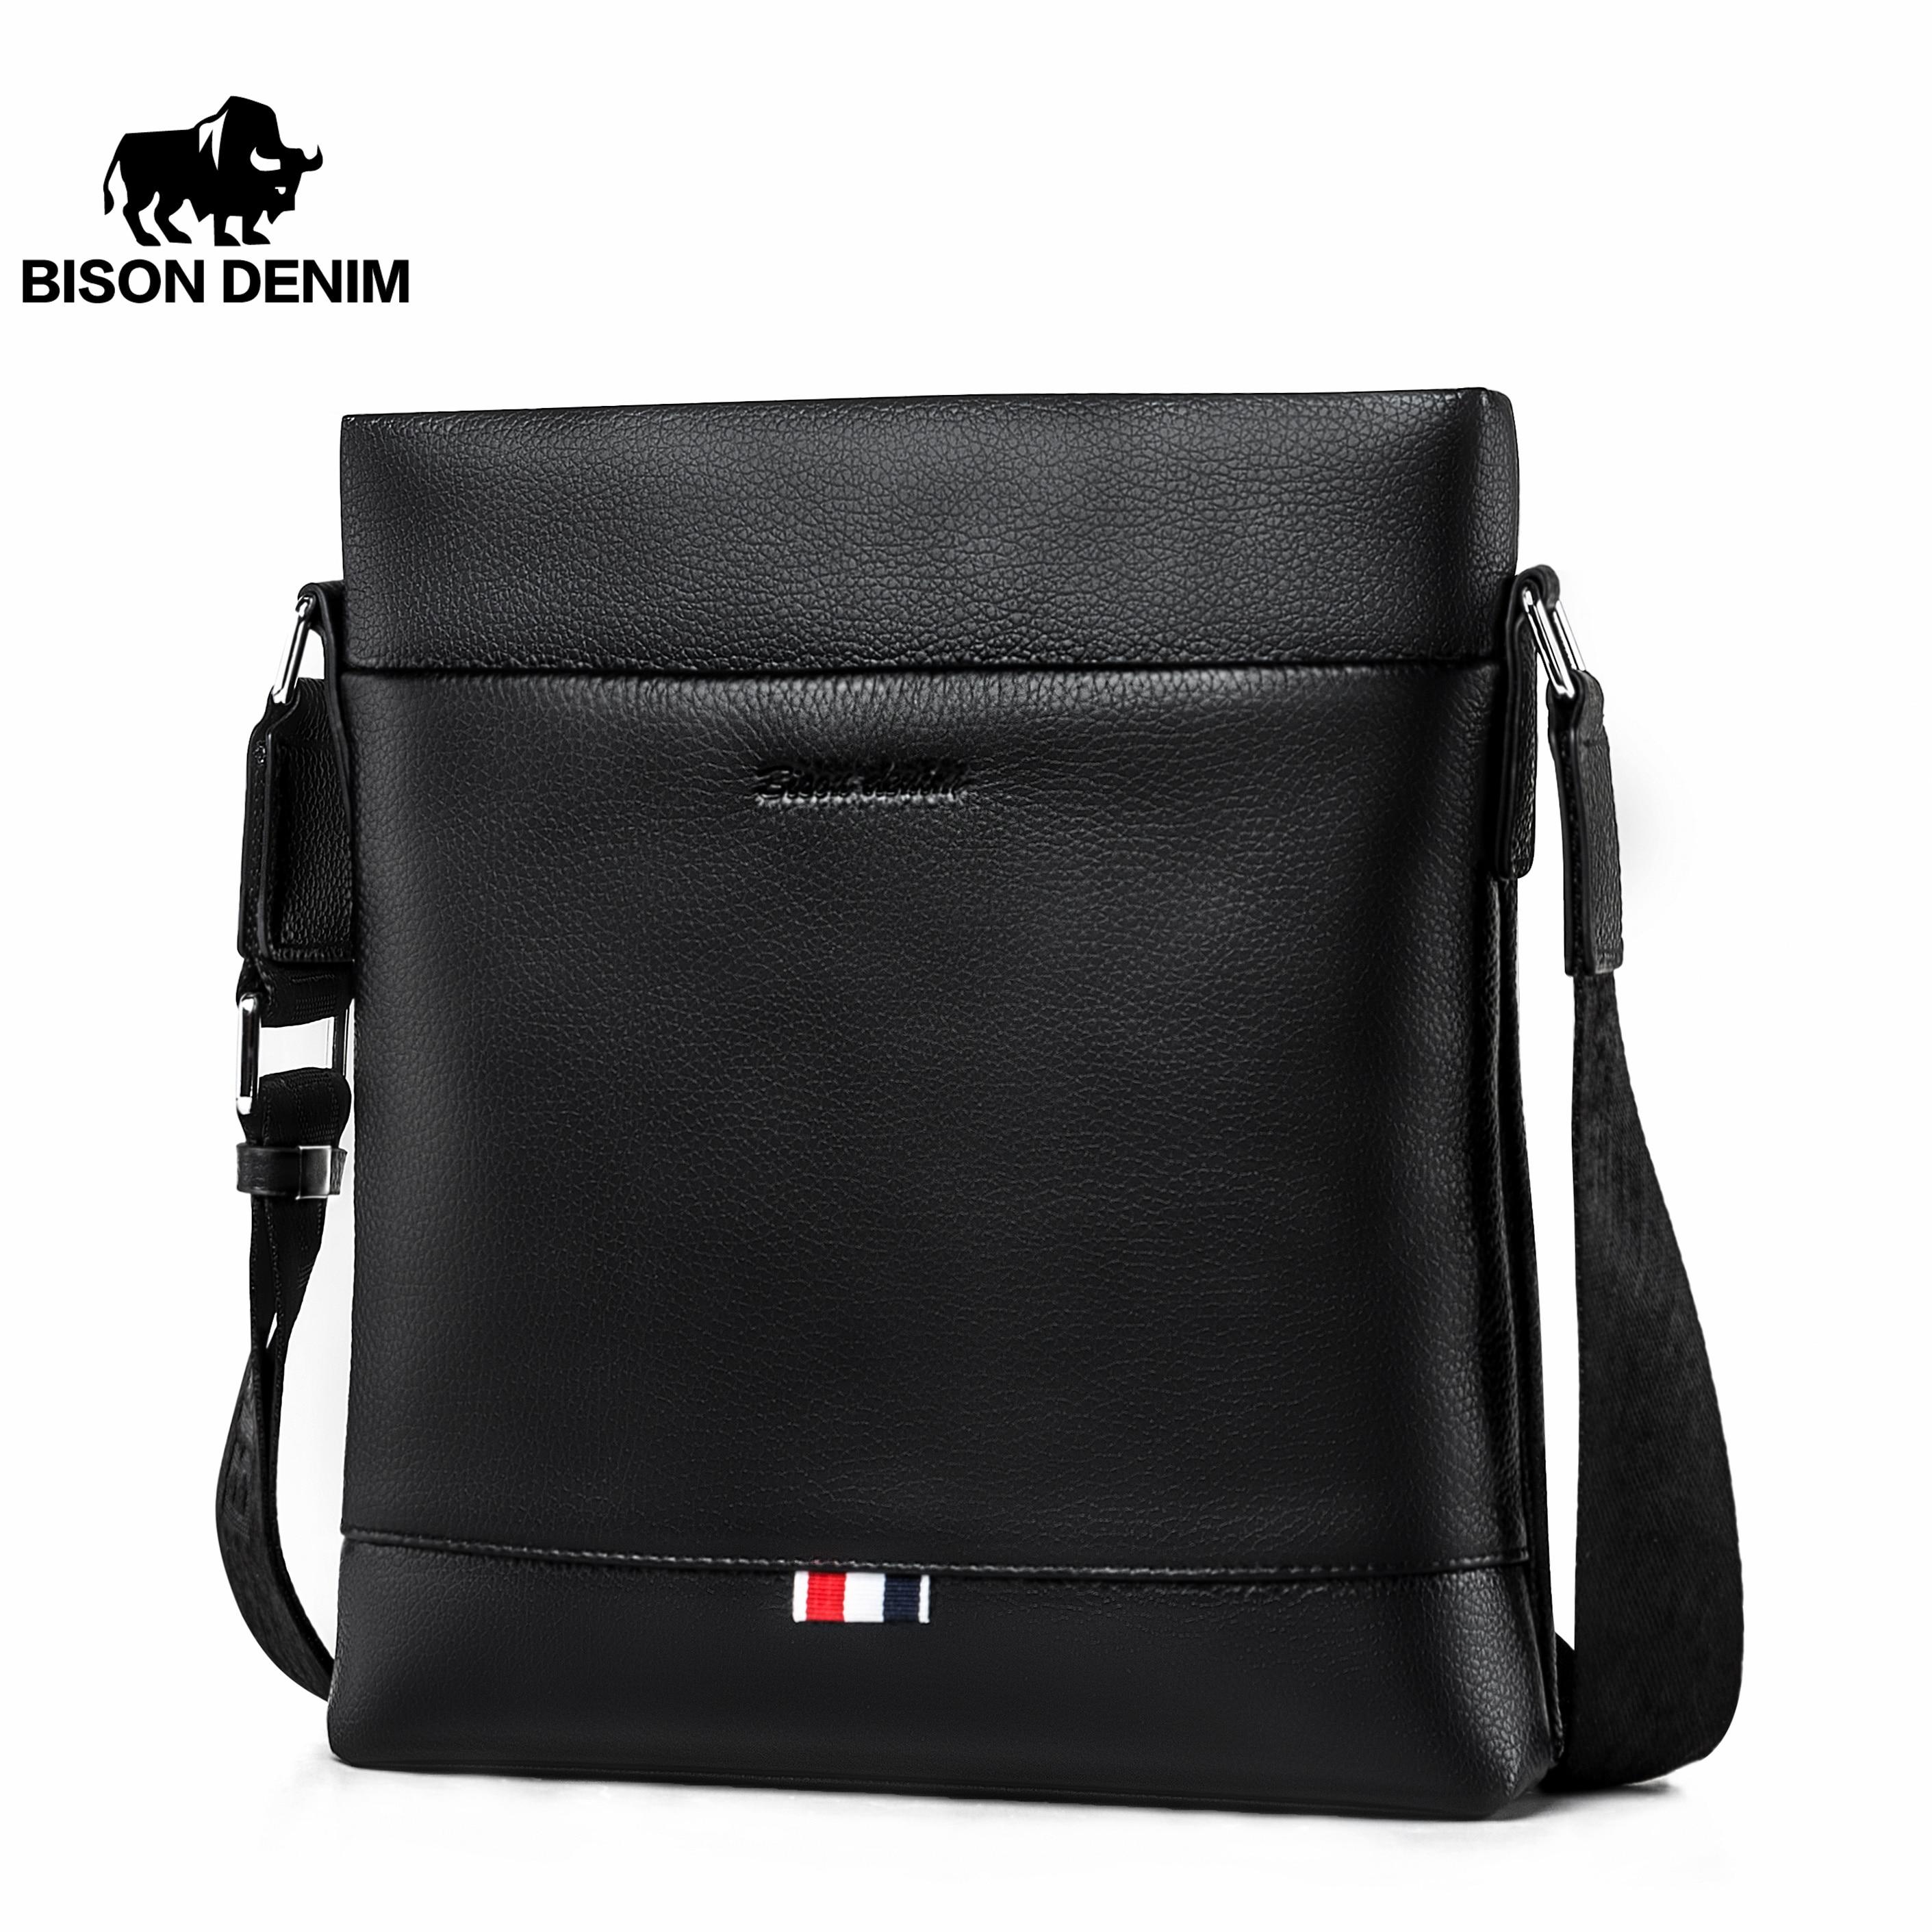 BISON DENIM Genuine Leather Men's shoulder Bag Casual Business Crossbody male Bag iPad Mens Messenger Bag Black bolsas N2821    - AliExpress